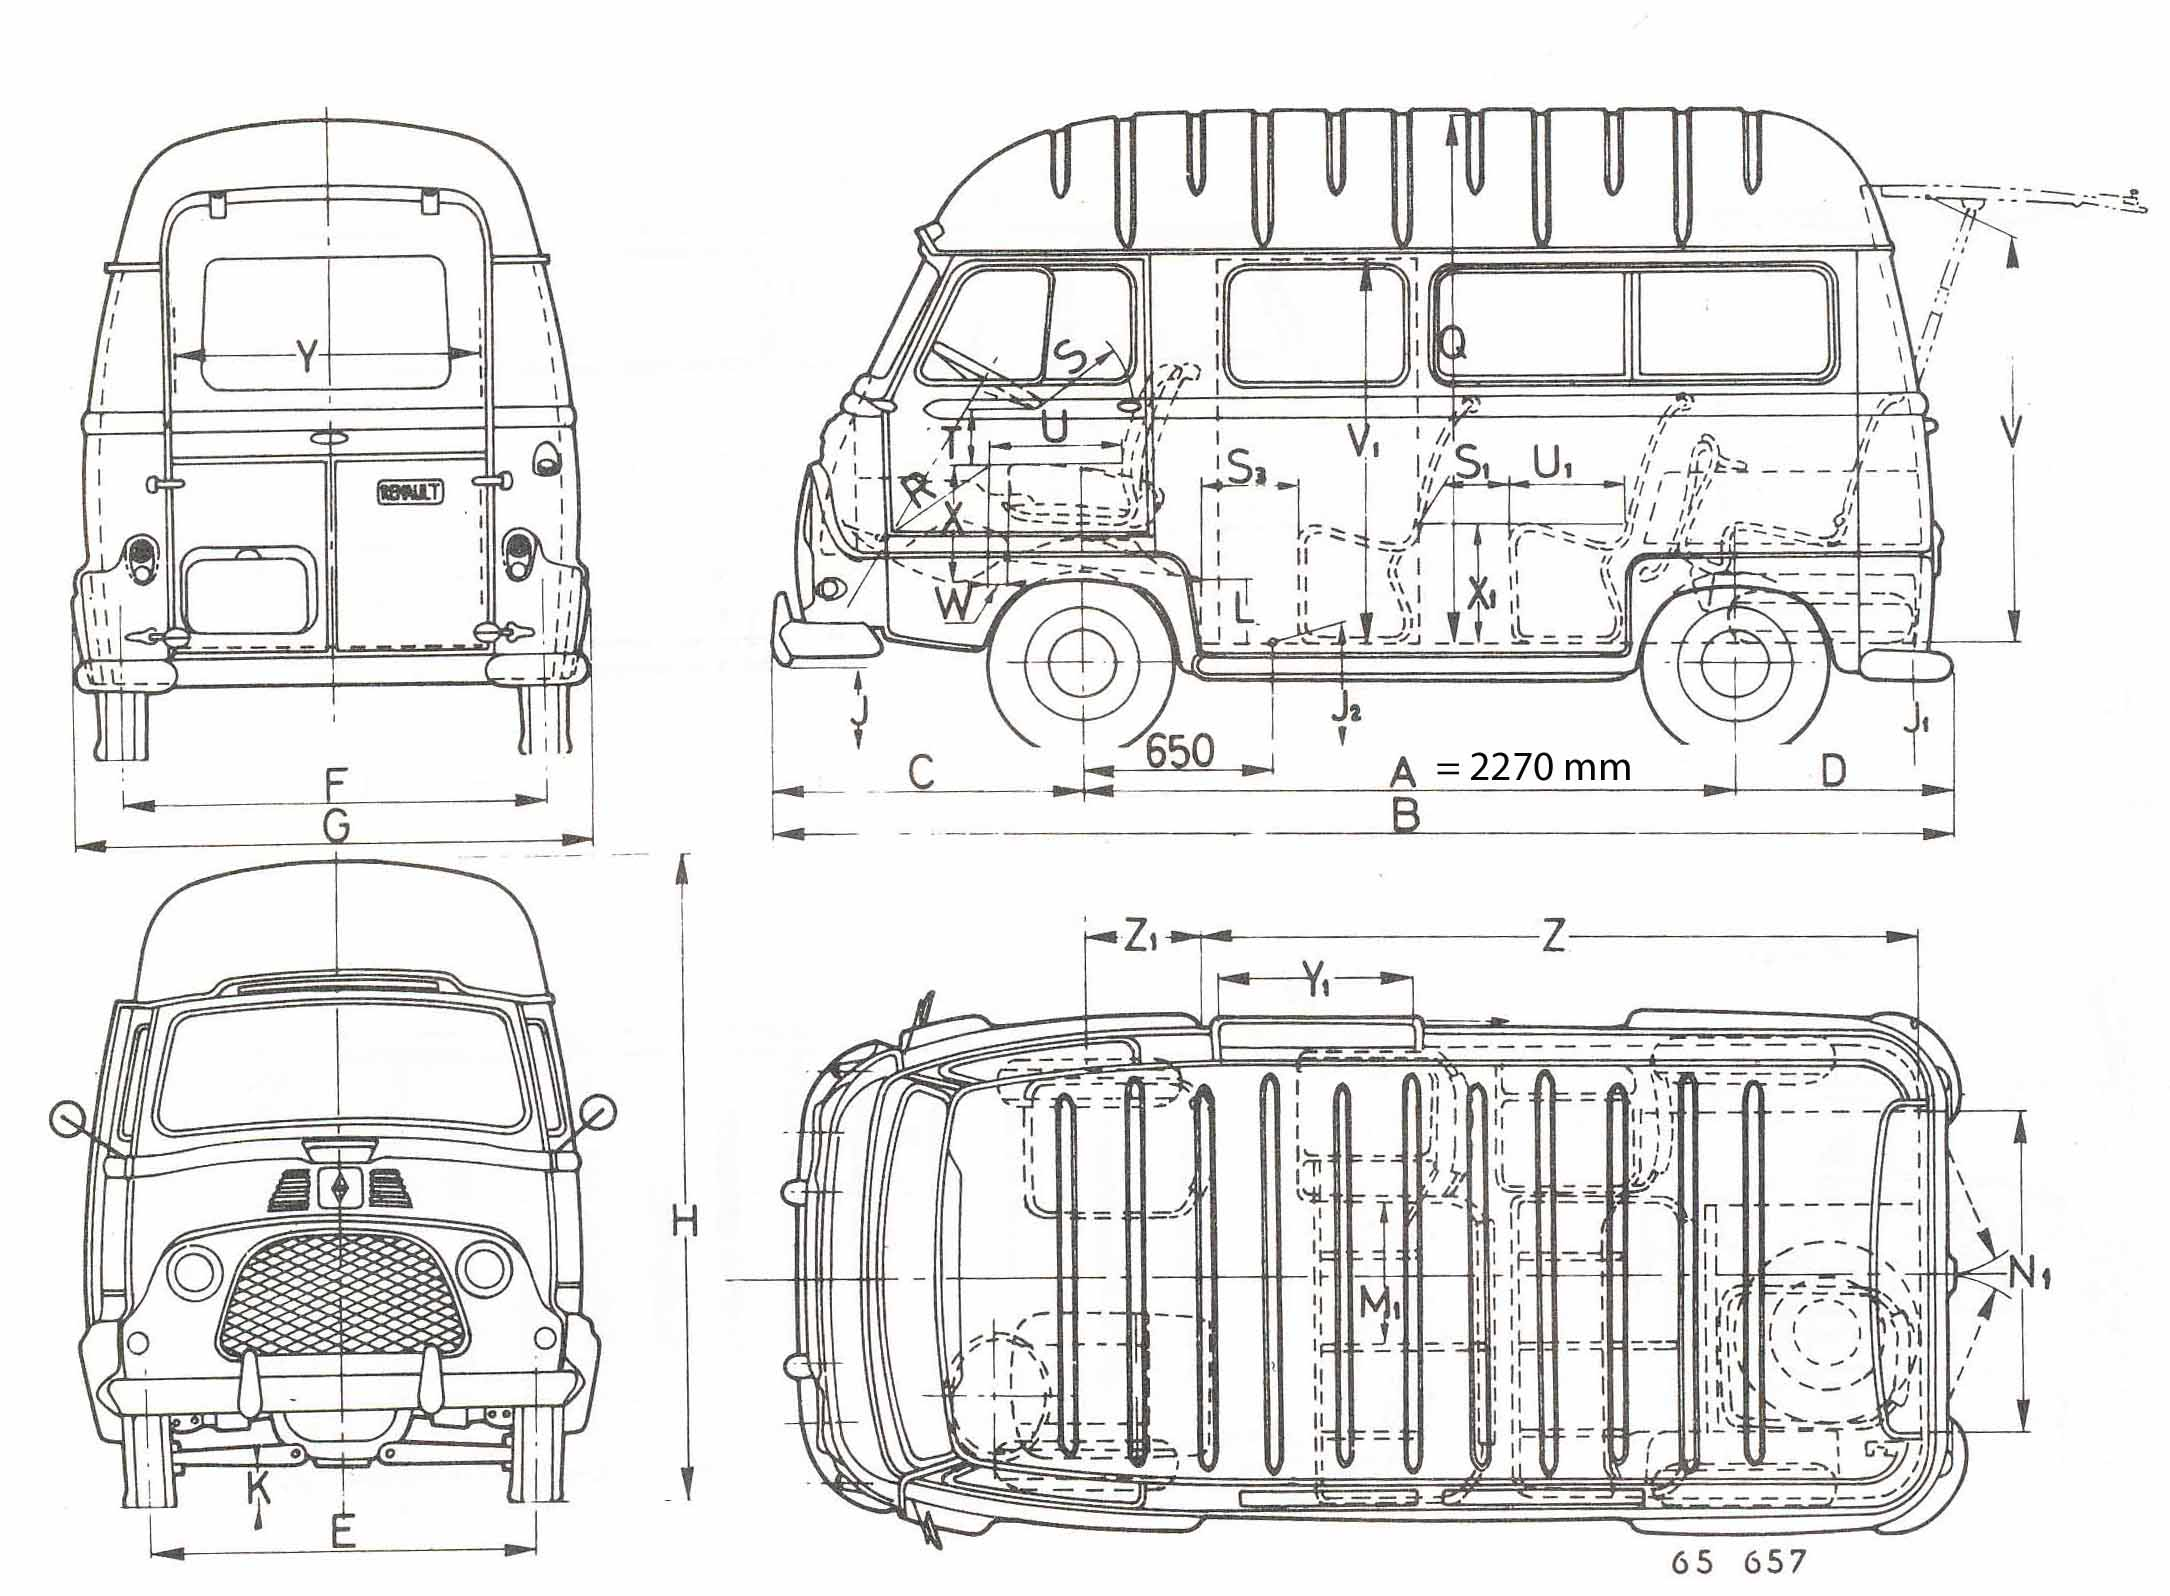 Renault Estafette 1967 Blueprint Download Free Blueprint